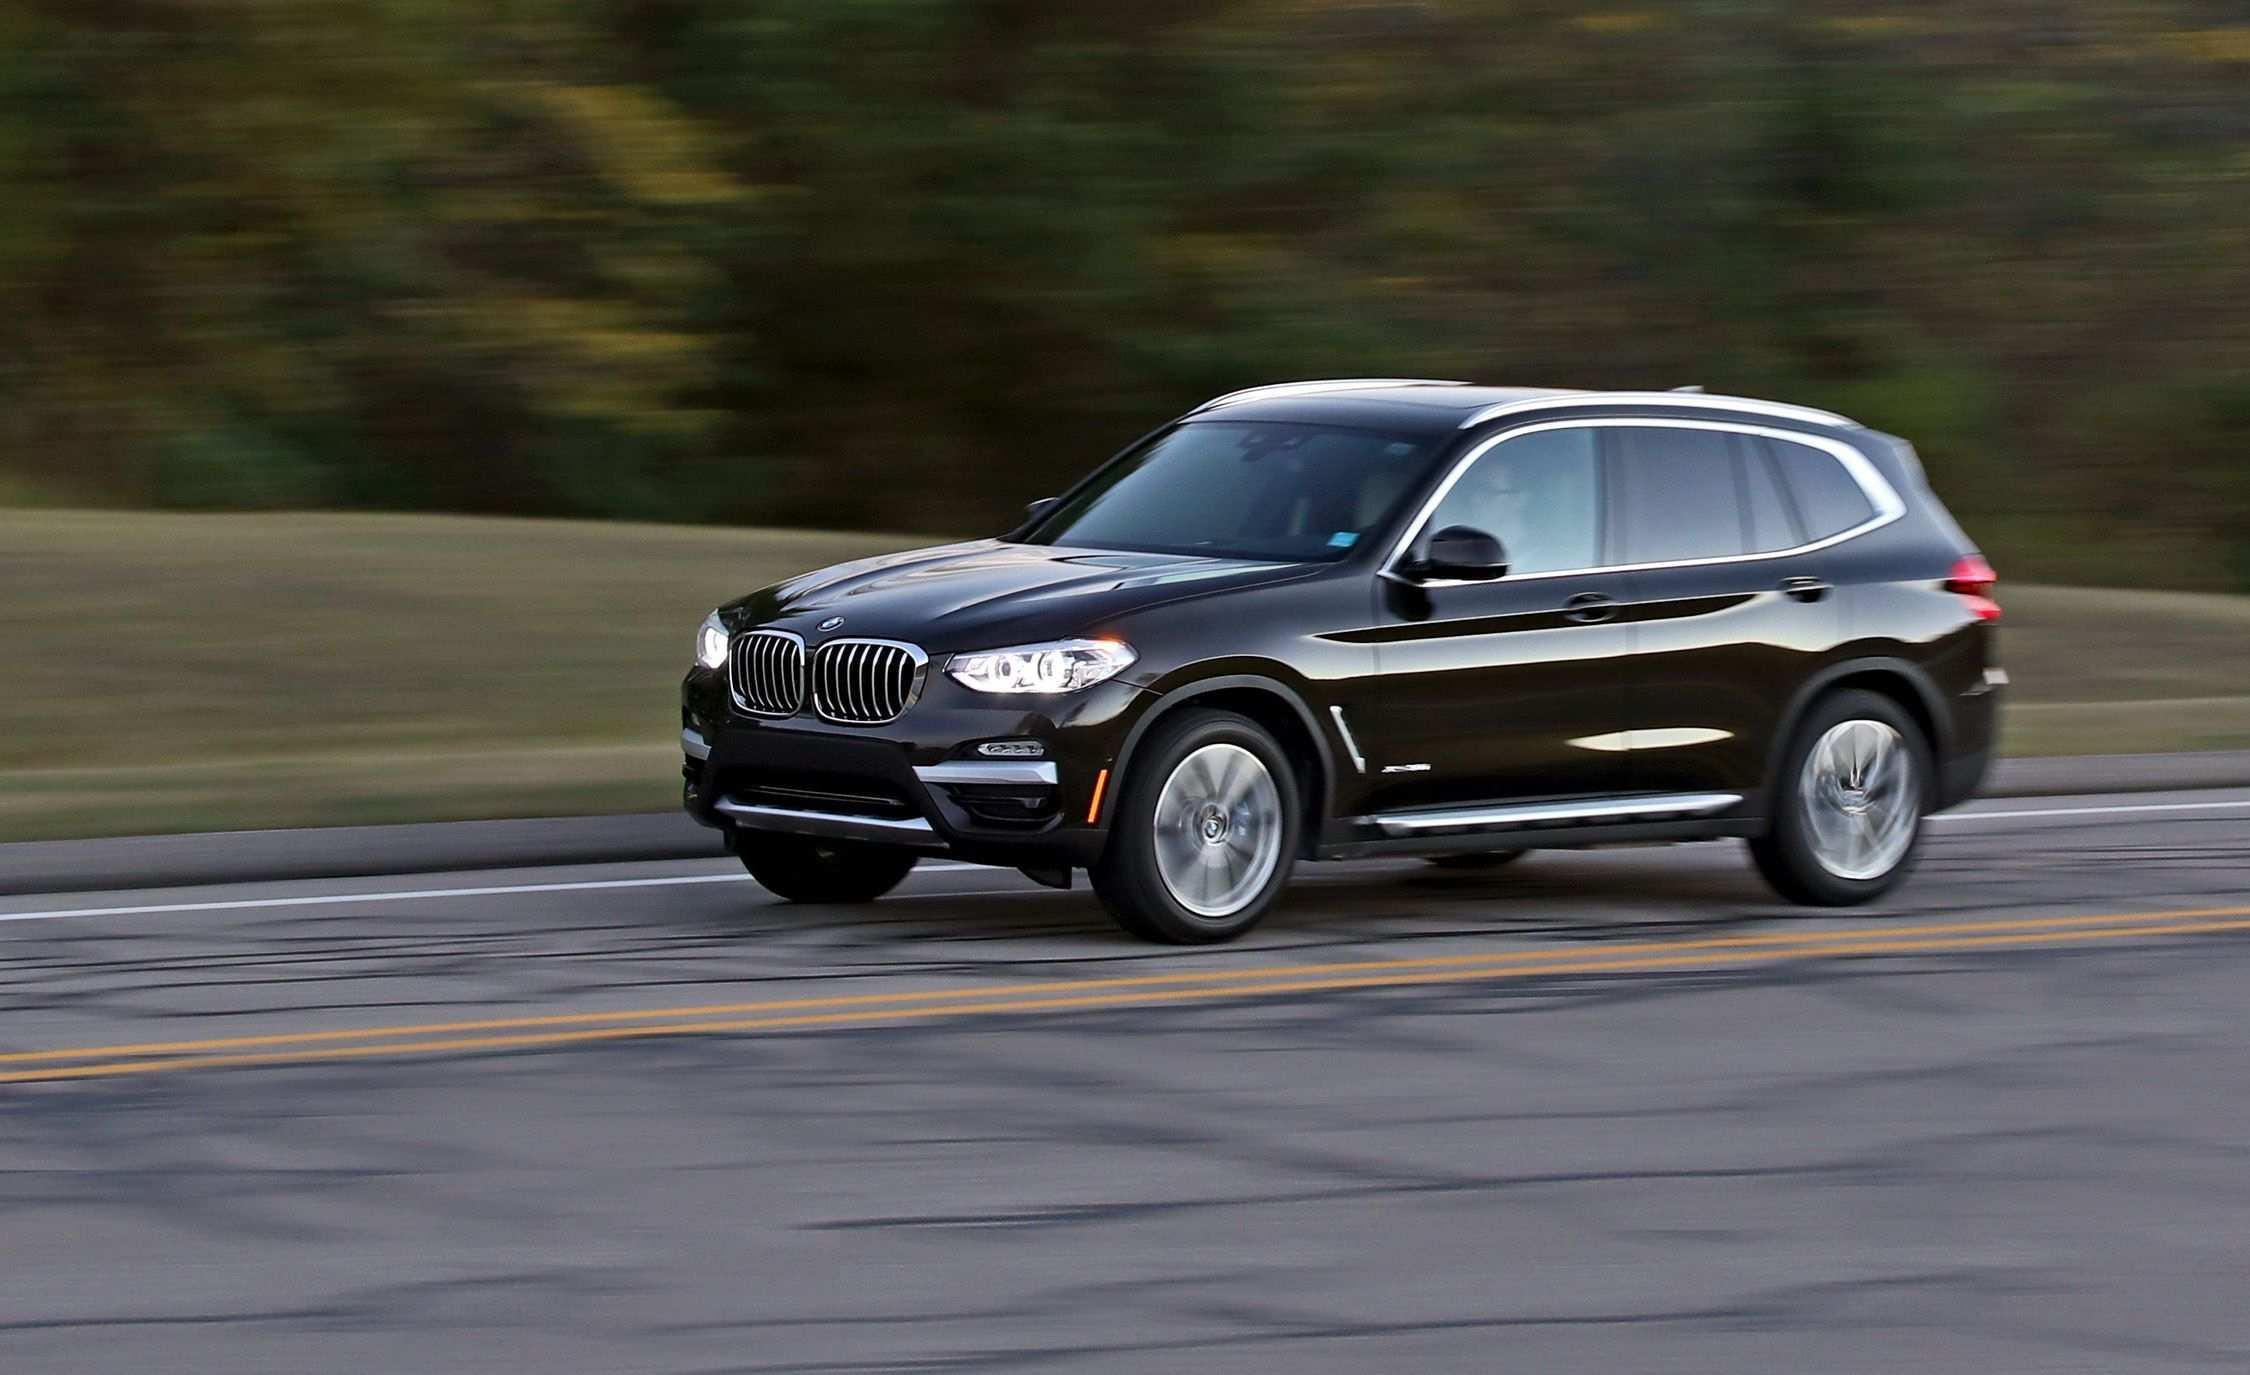 63 Great 2020 BMW Sierra Gas Mileage Concept with 2020 BMW Sierra Gas Mileage